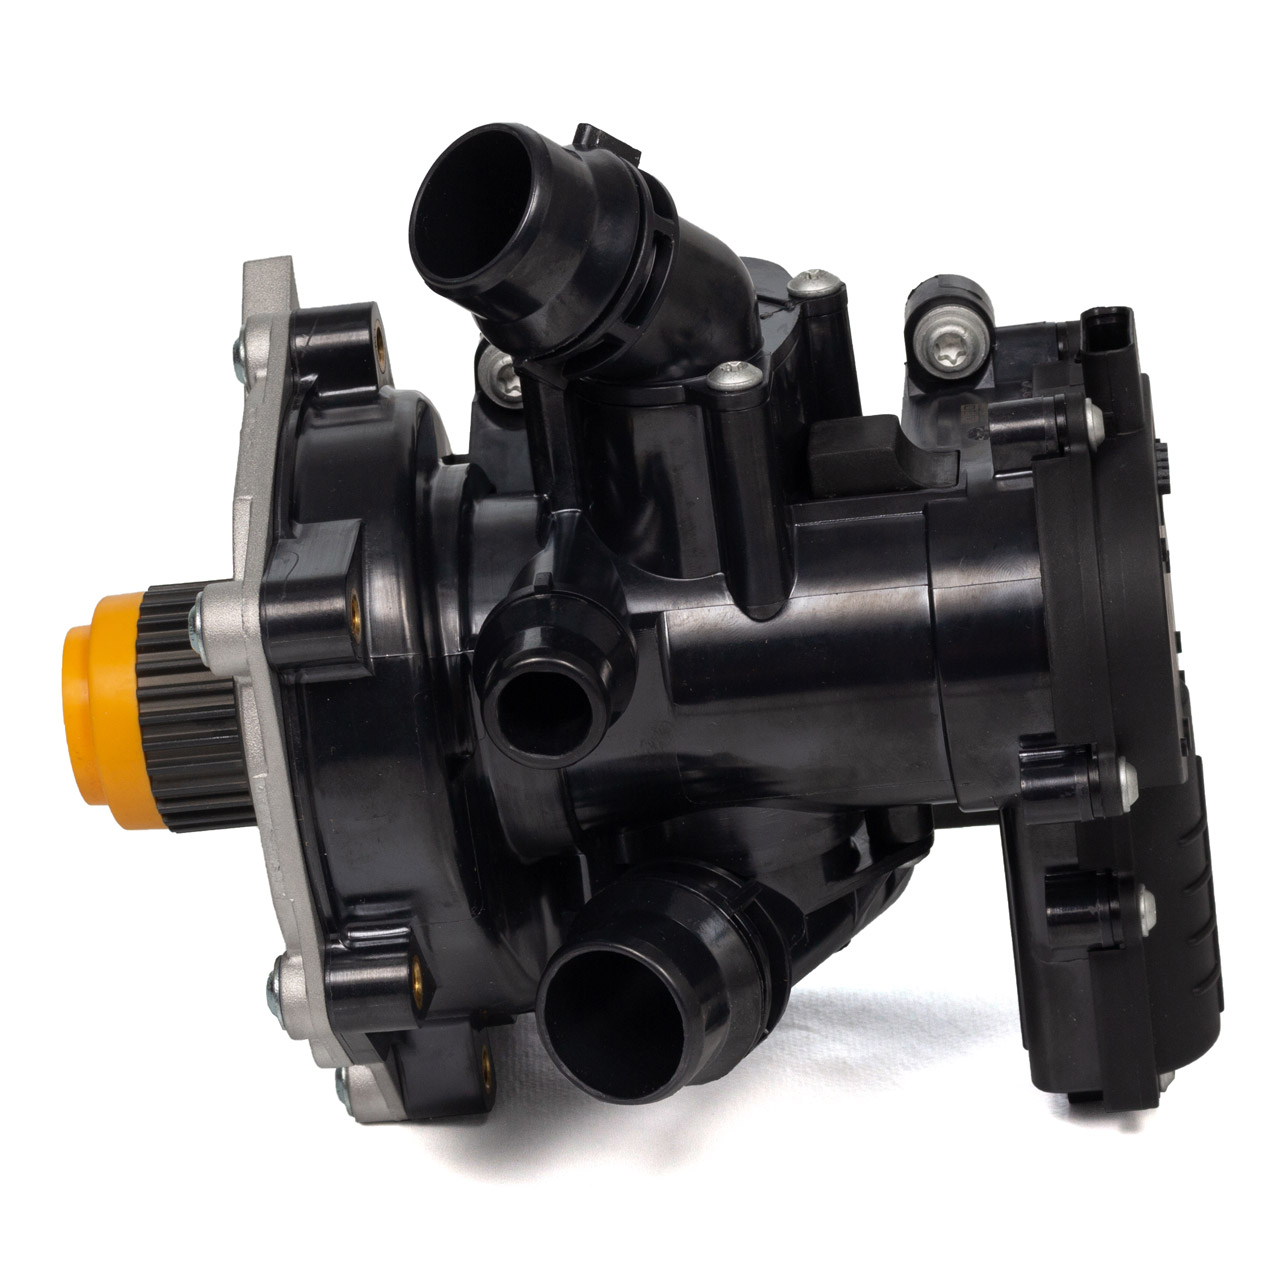 GEBA K11235/1B Wasserpumpe + Dichtung AUDI SEAT SKODA VW 1.8/2.0 TSI GTI PORSCHE Macan 2.0